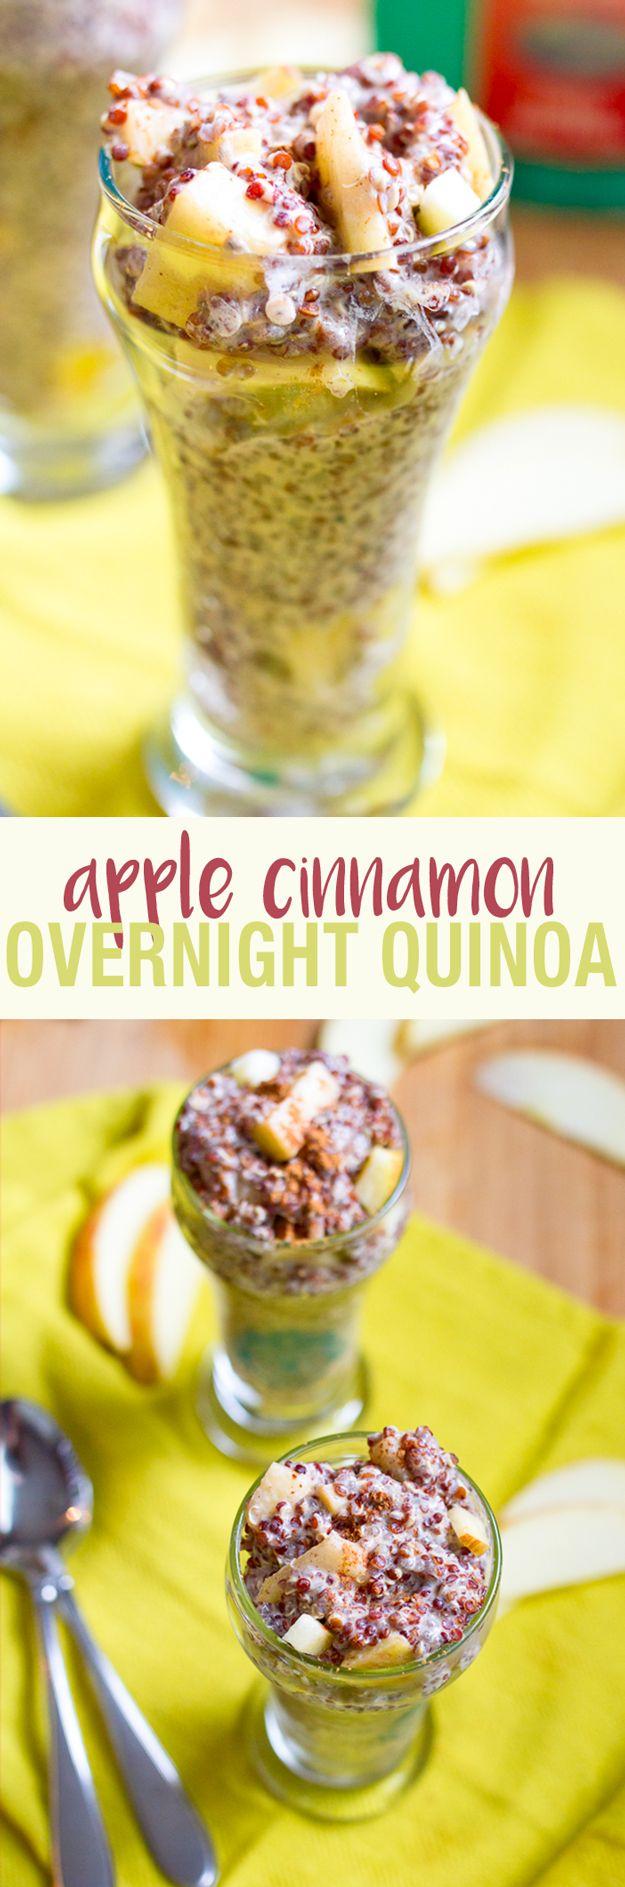 Apple Cinnamon Overnight Quinoa